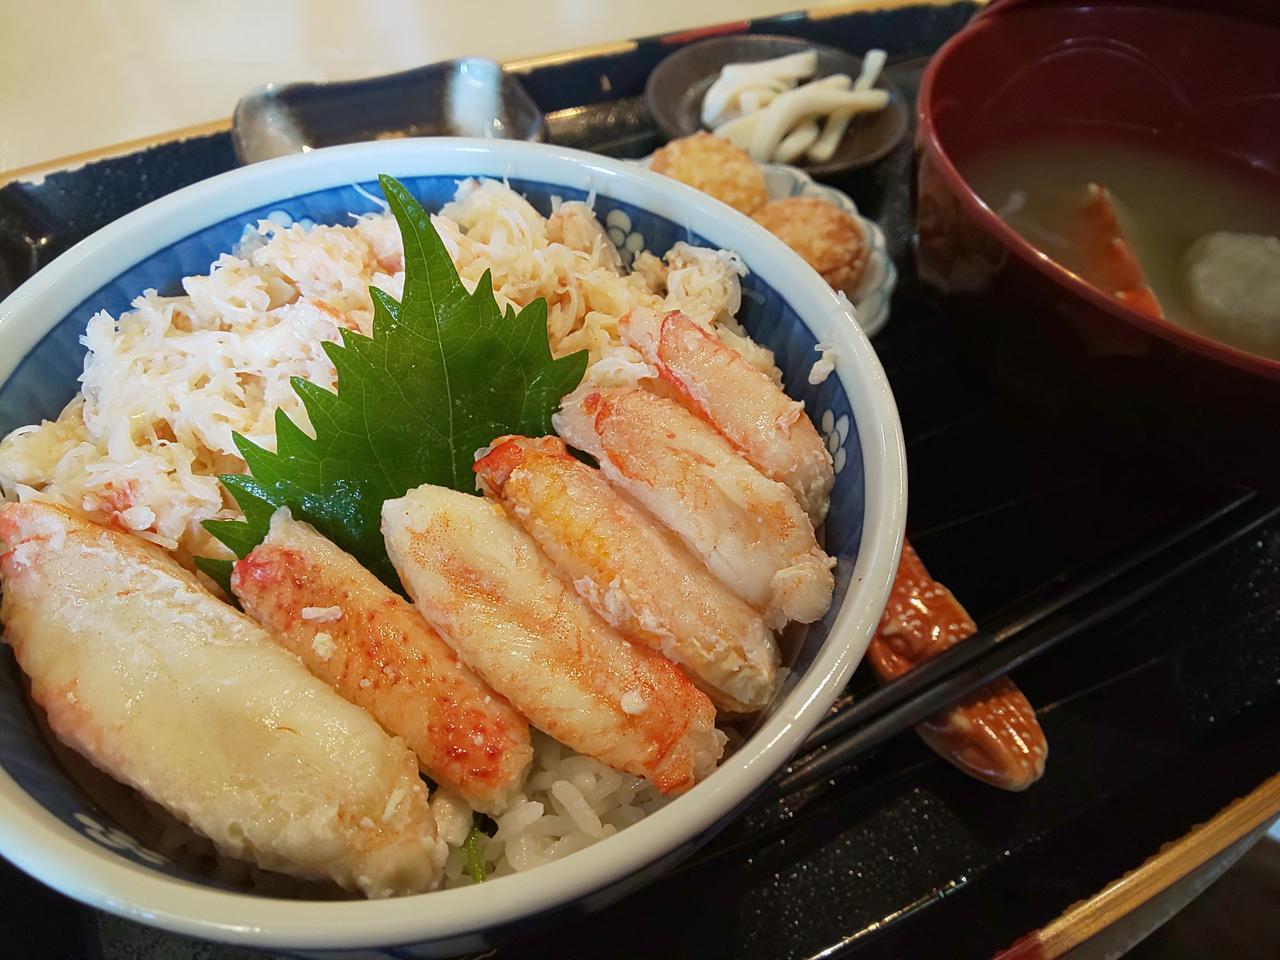 Images : 紋別漁師食堂 (【旧店名】松本商店)